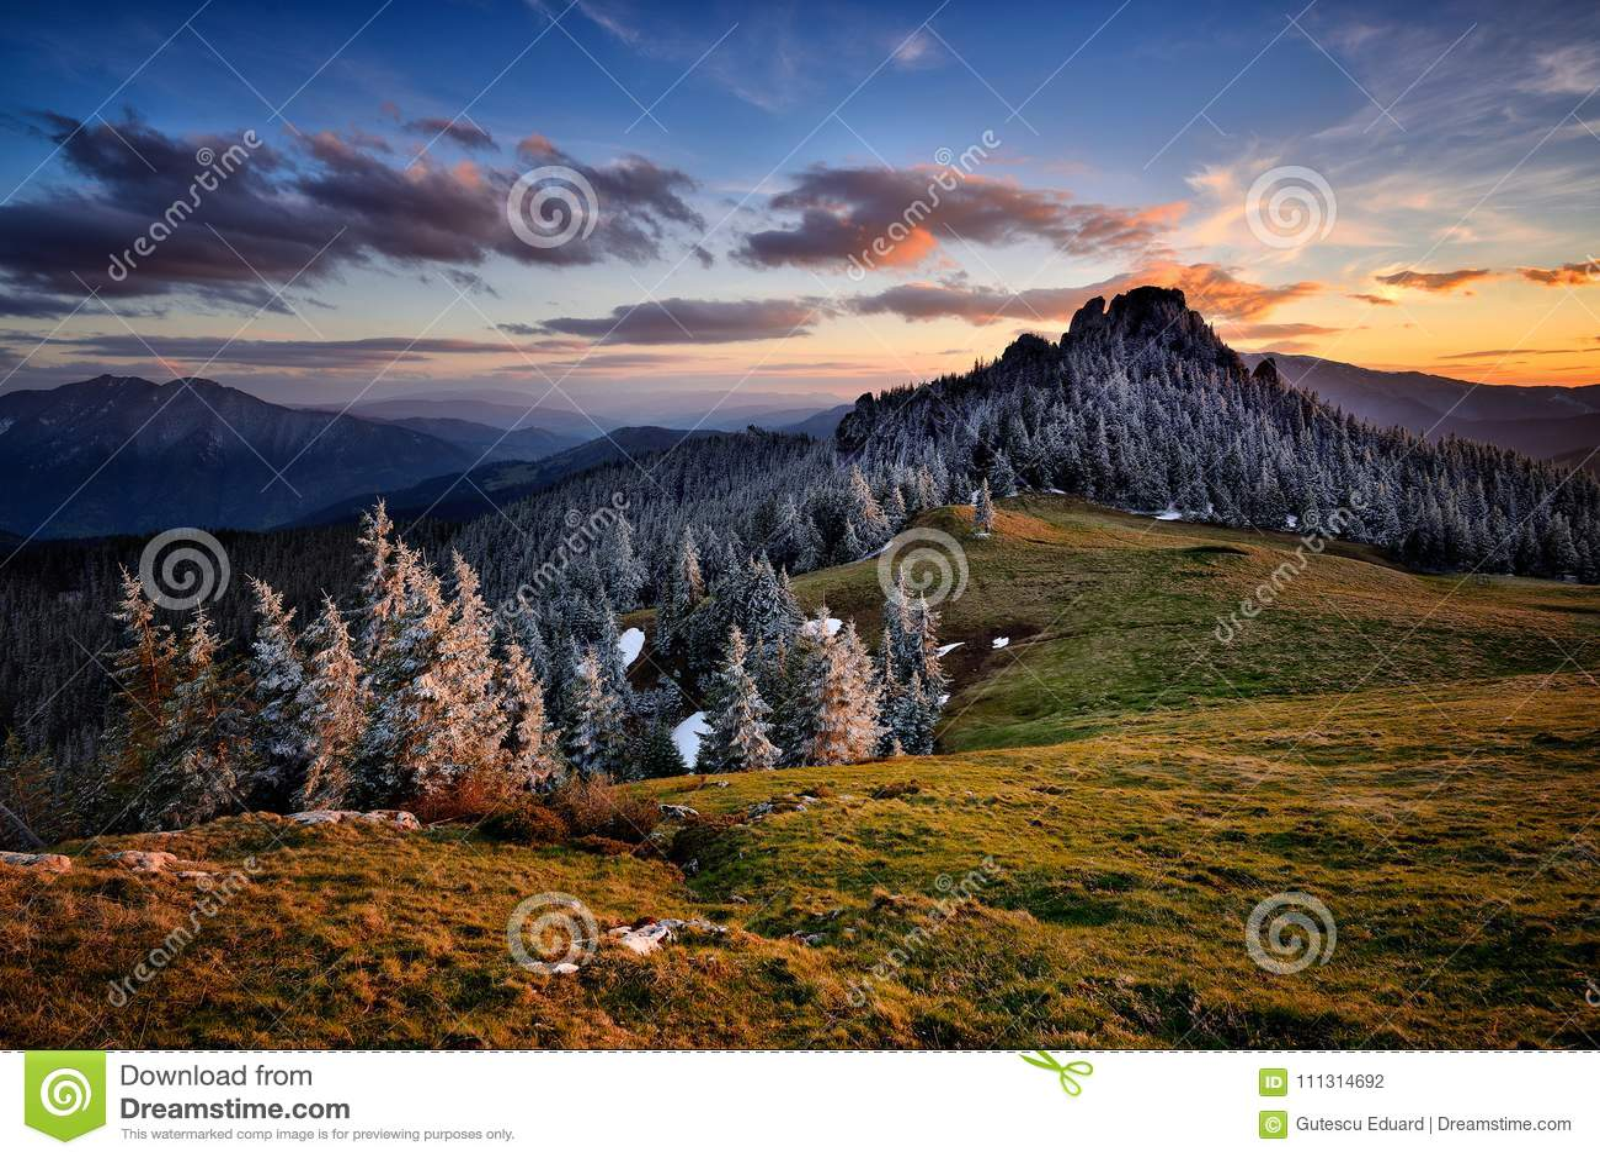 Winter scene in Romania , beautiful landscape of wild Carpathian mountains